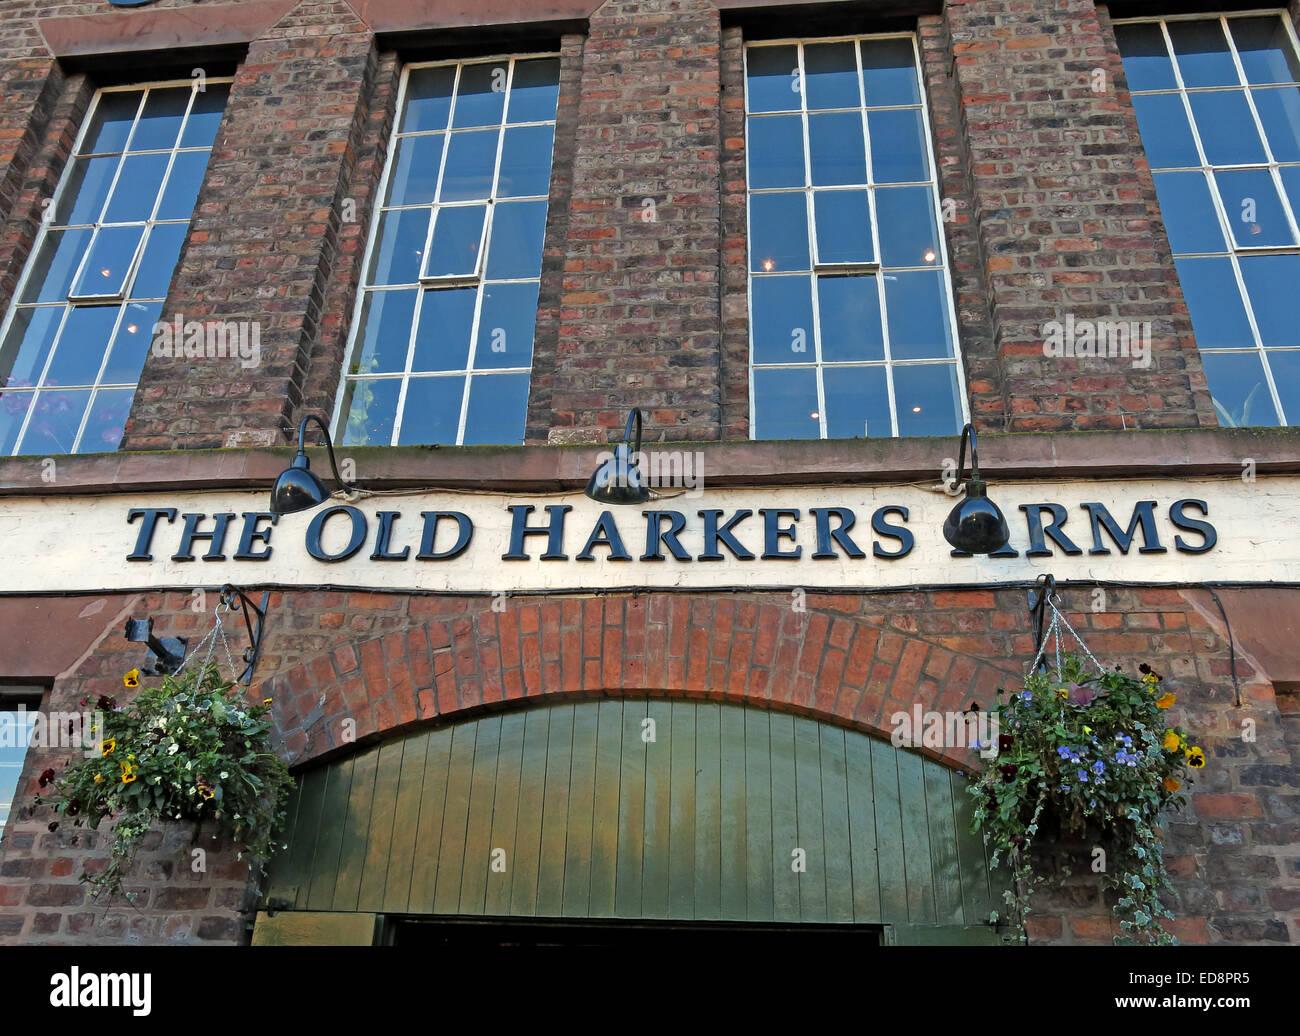 Laden Sie dieses Alamy Stockfoto Die alten Harkers Arme Canalside, Stadt Chester, England, UK - ED8PR5